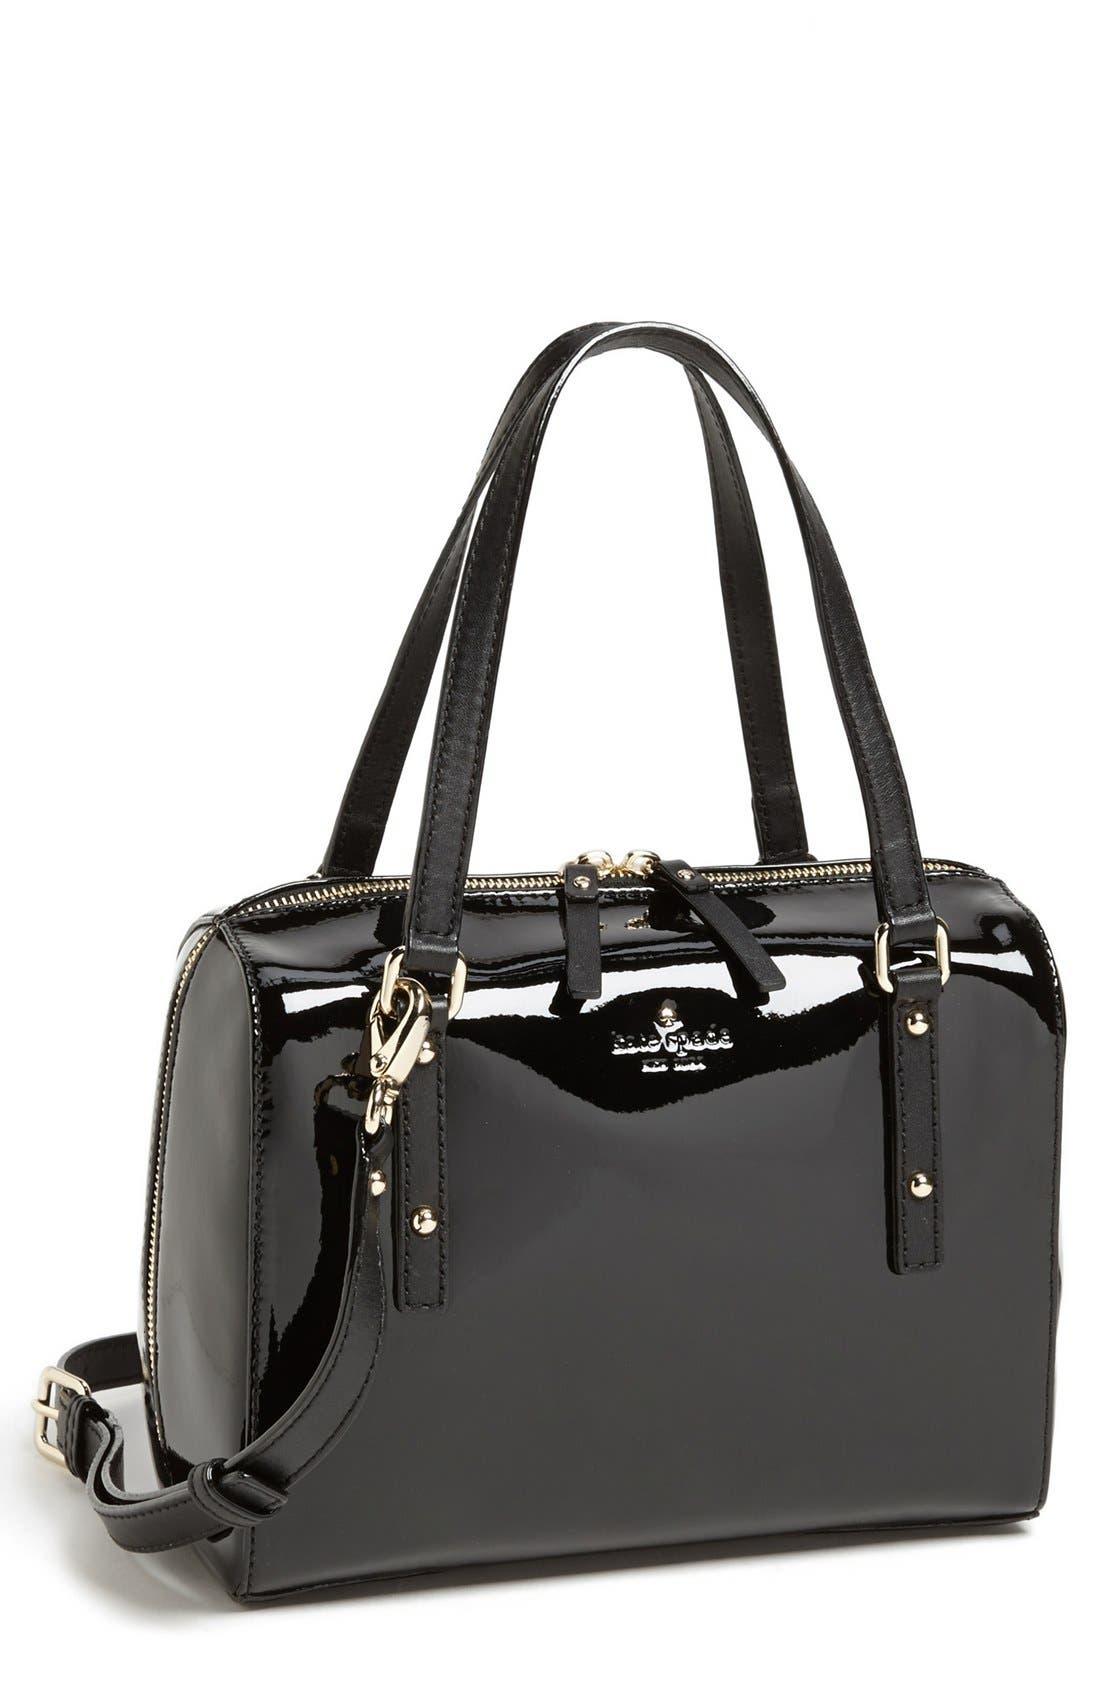 Main Image - kate spade new york 'jackson square - small damien' crossbody bag